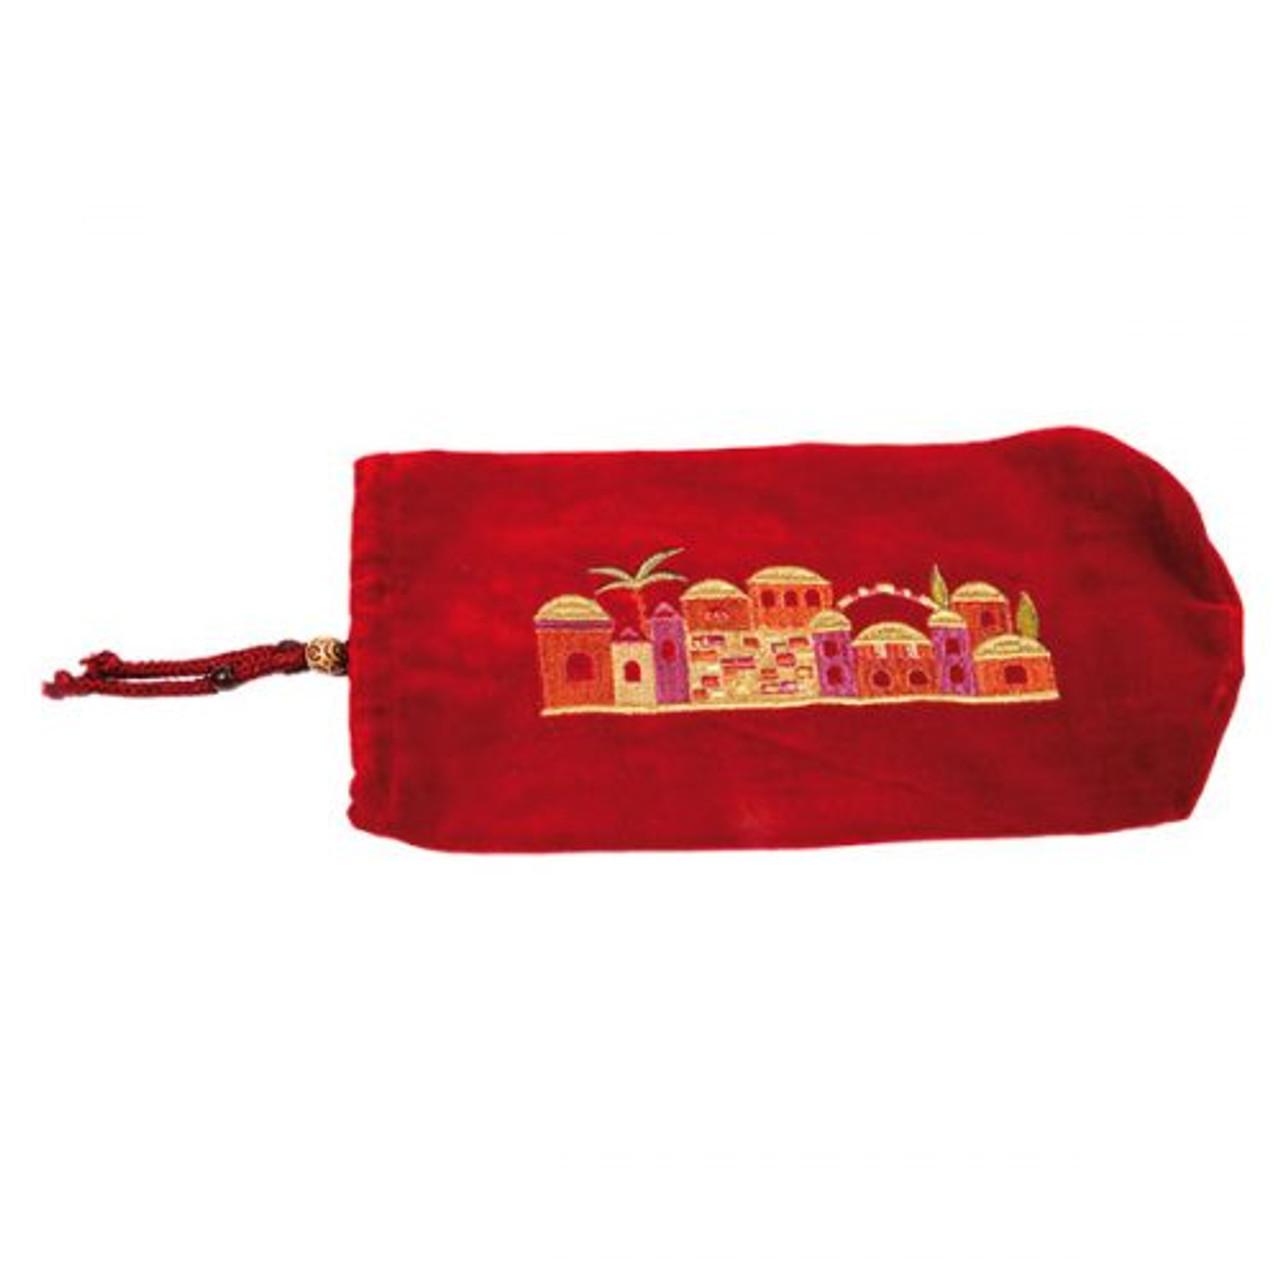 Maroon & Gold Ram's Horn Shofar Bag